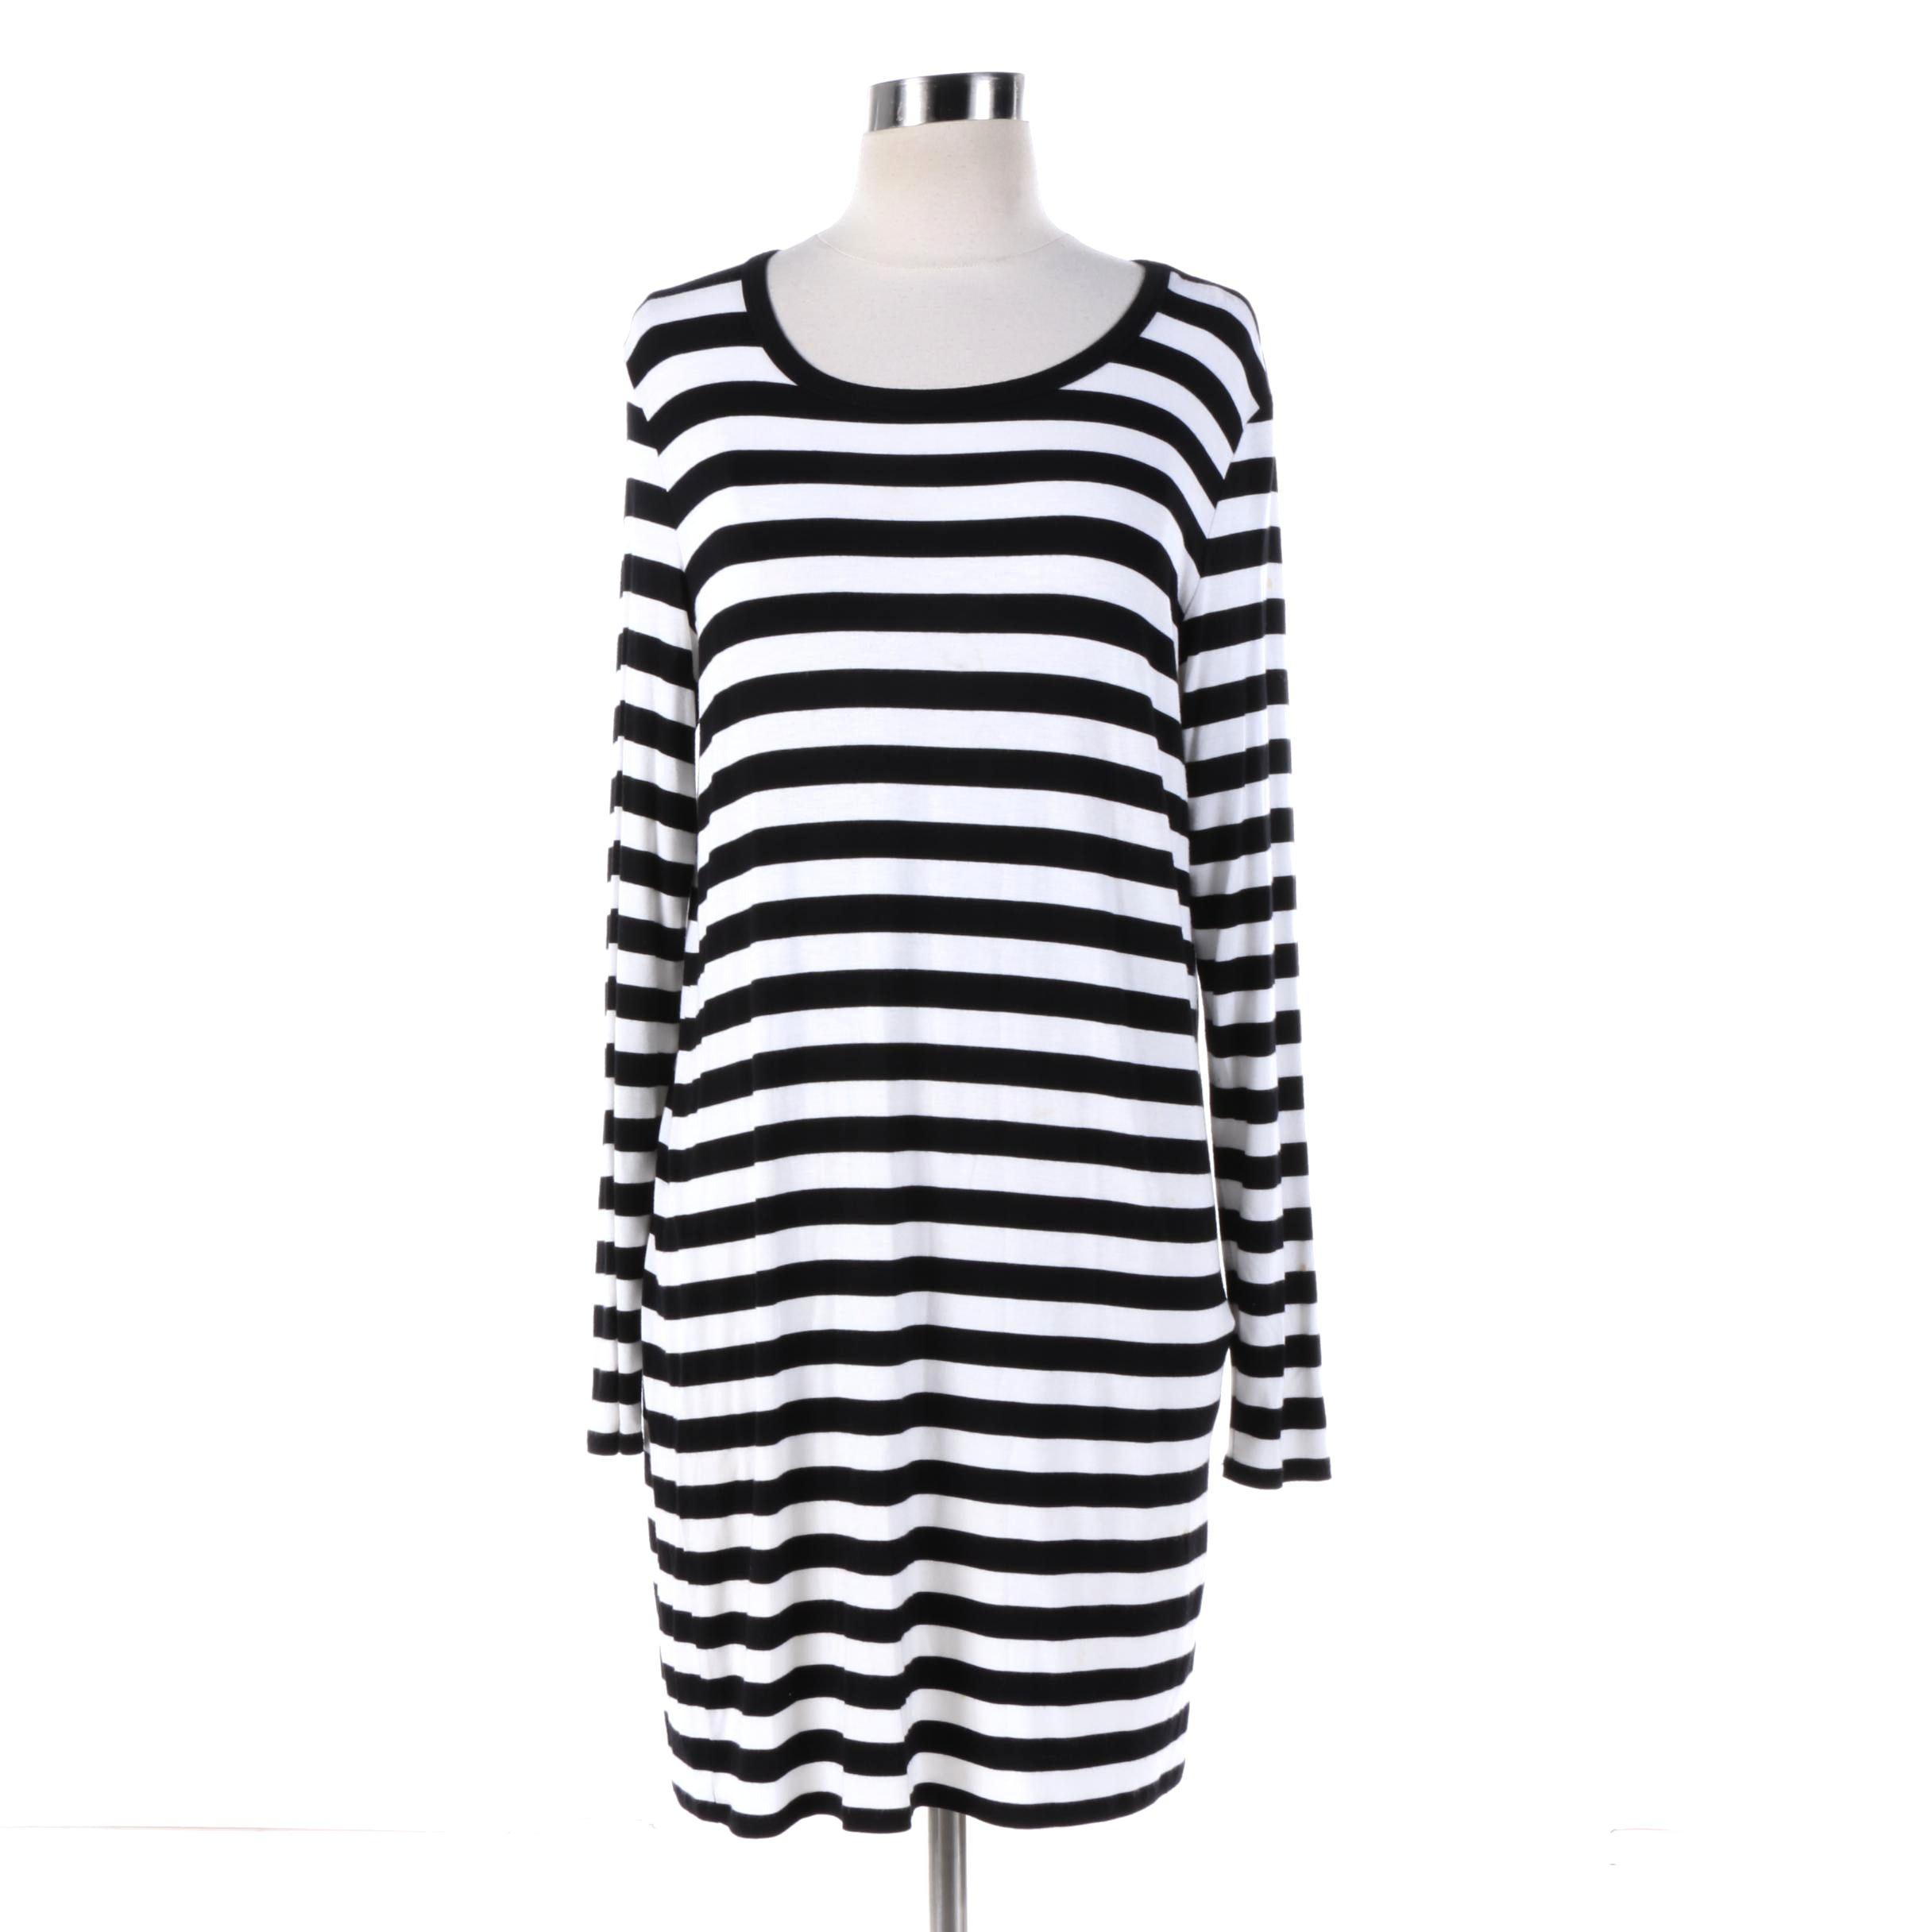 Women's Michael Michael Kors Black and White Striped Shirt Dress